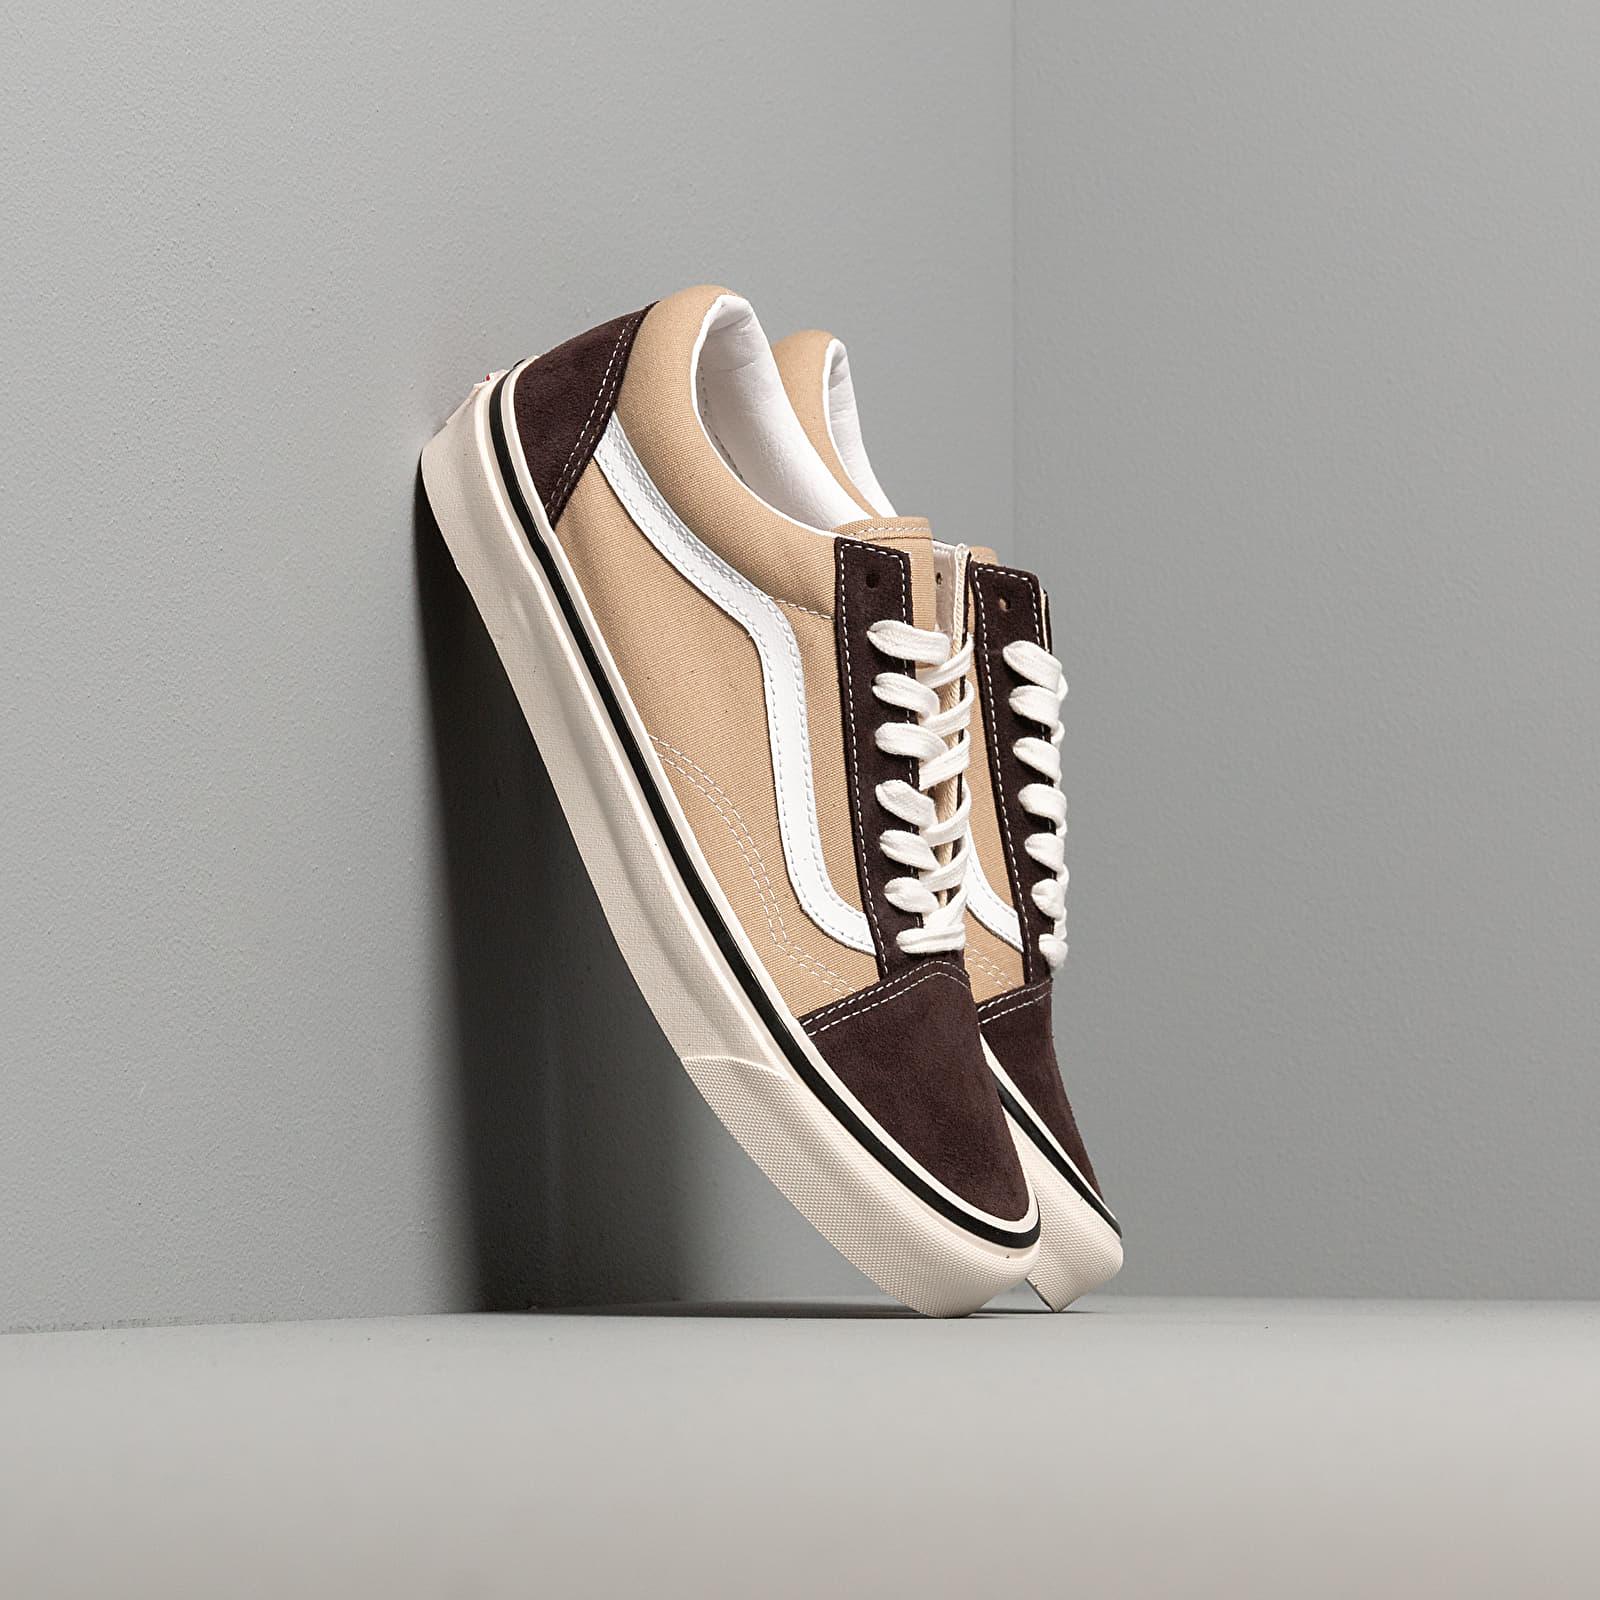 Women's New Style Footwers Vans Old Skool Light Khaki